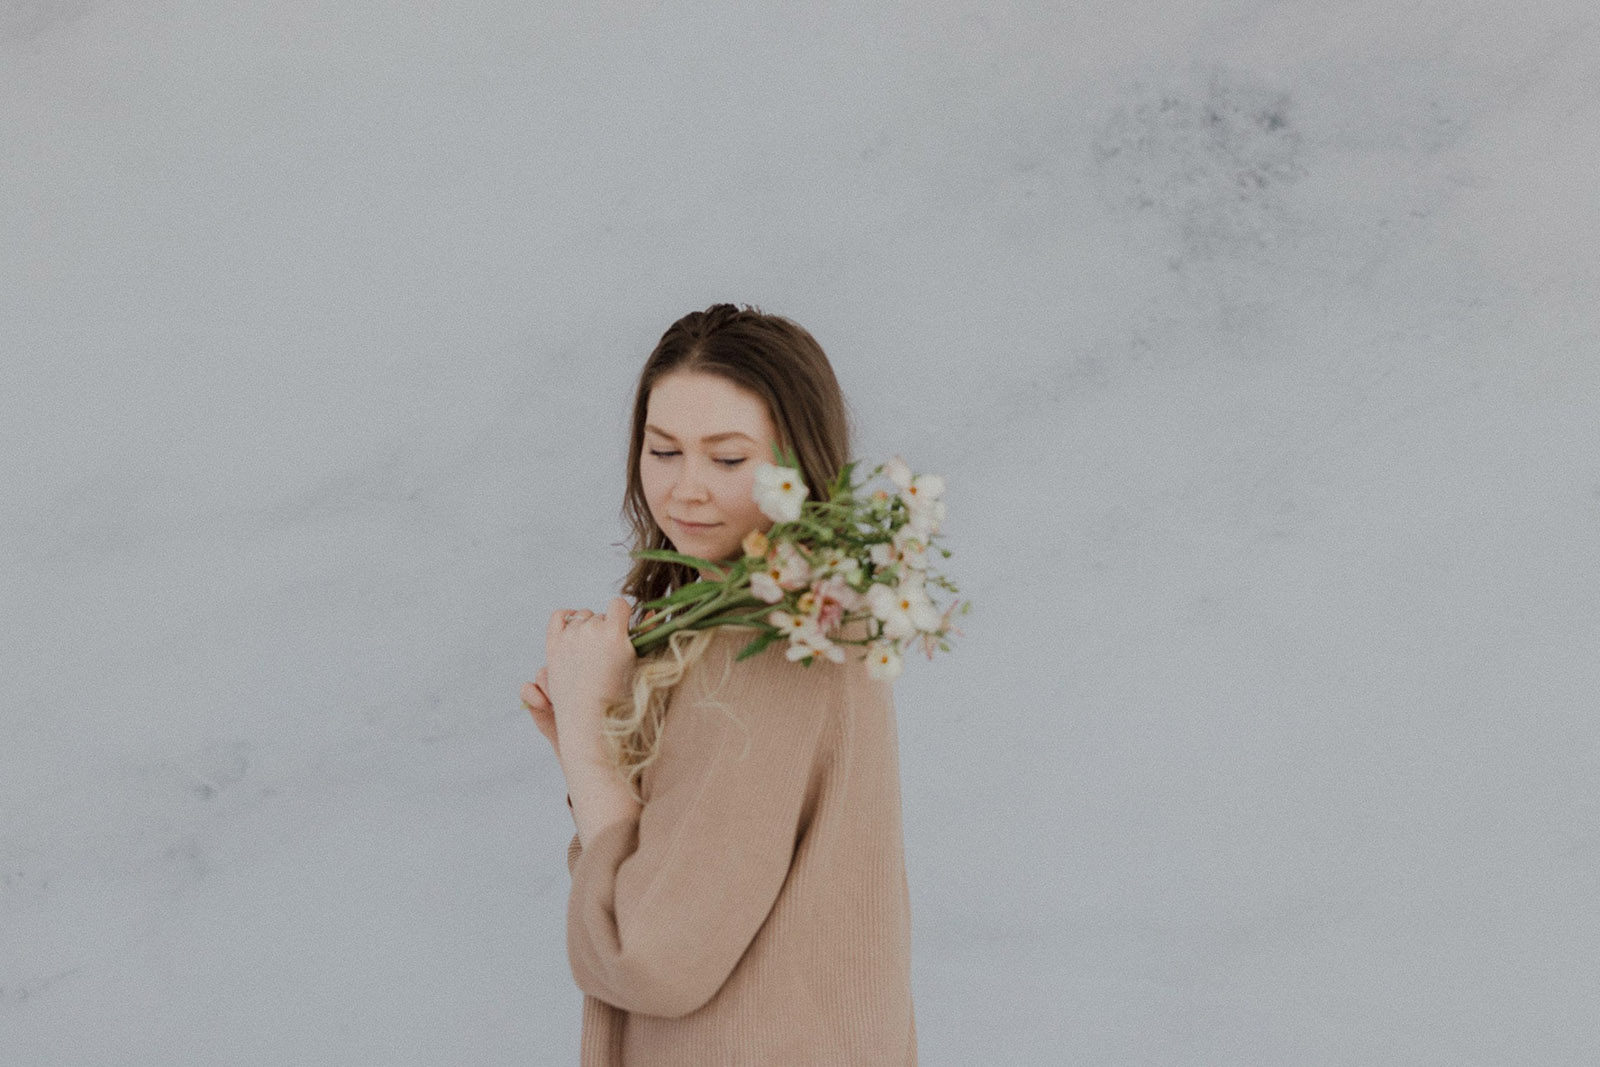 Sonia-V-Photography-Candid-Documentary-Style-Wedding-Photographer-Ottawa-Ontario-AM-Floral-Studio-Aligned-Branding-Brand-Photoshoot-Florist-Ottawa-Ontario-Moody-Brand-Photography.